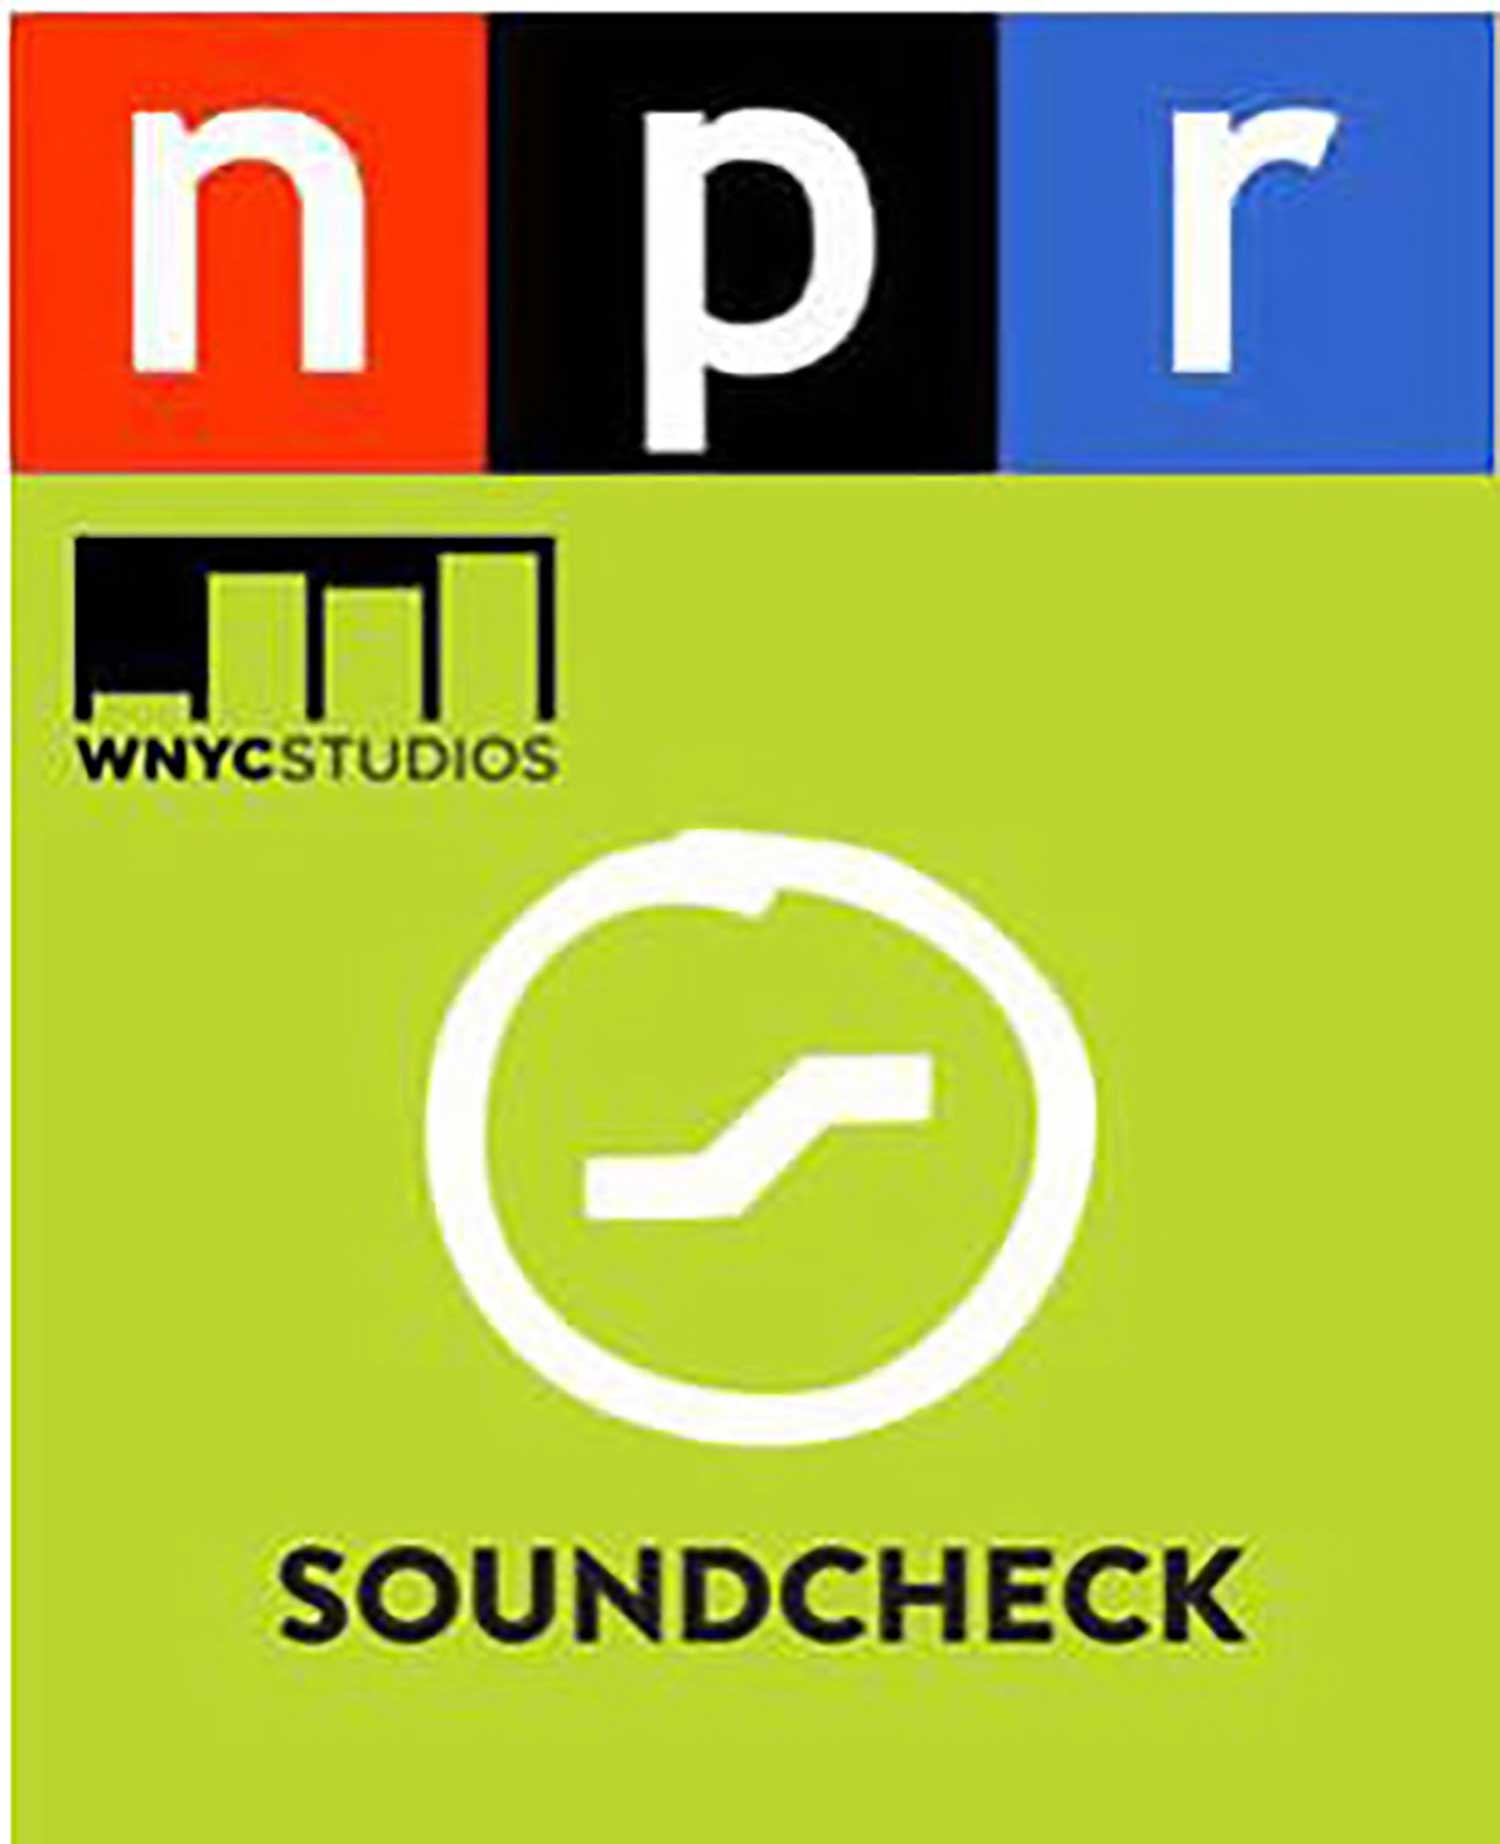 NPR-Wedding-Band-versus-DJ-WNYC.jpg